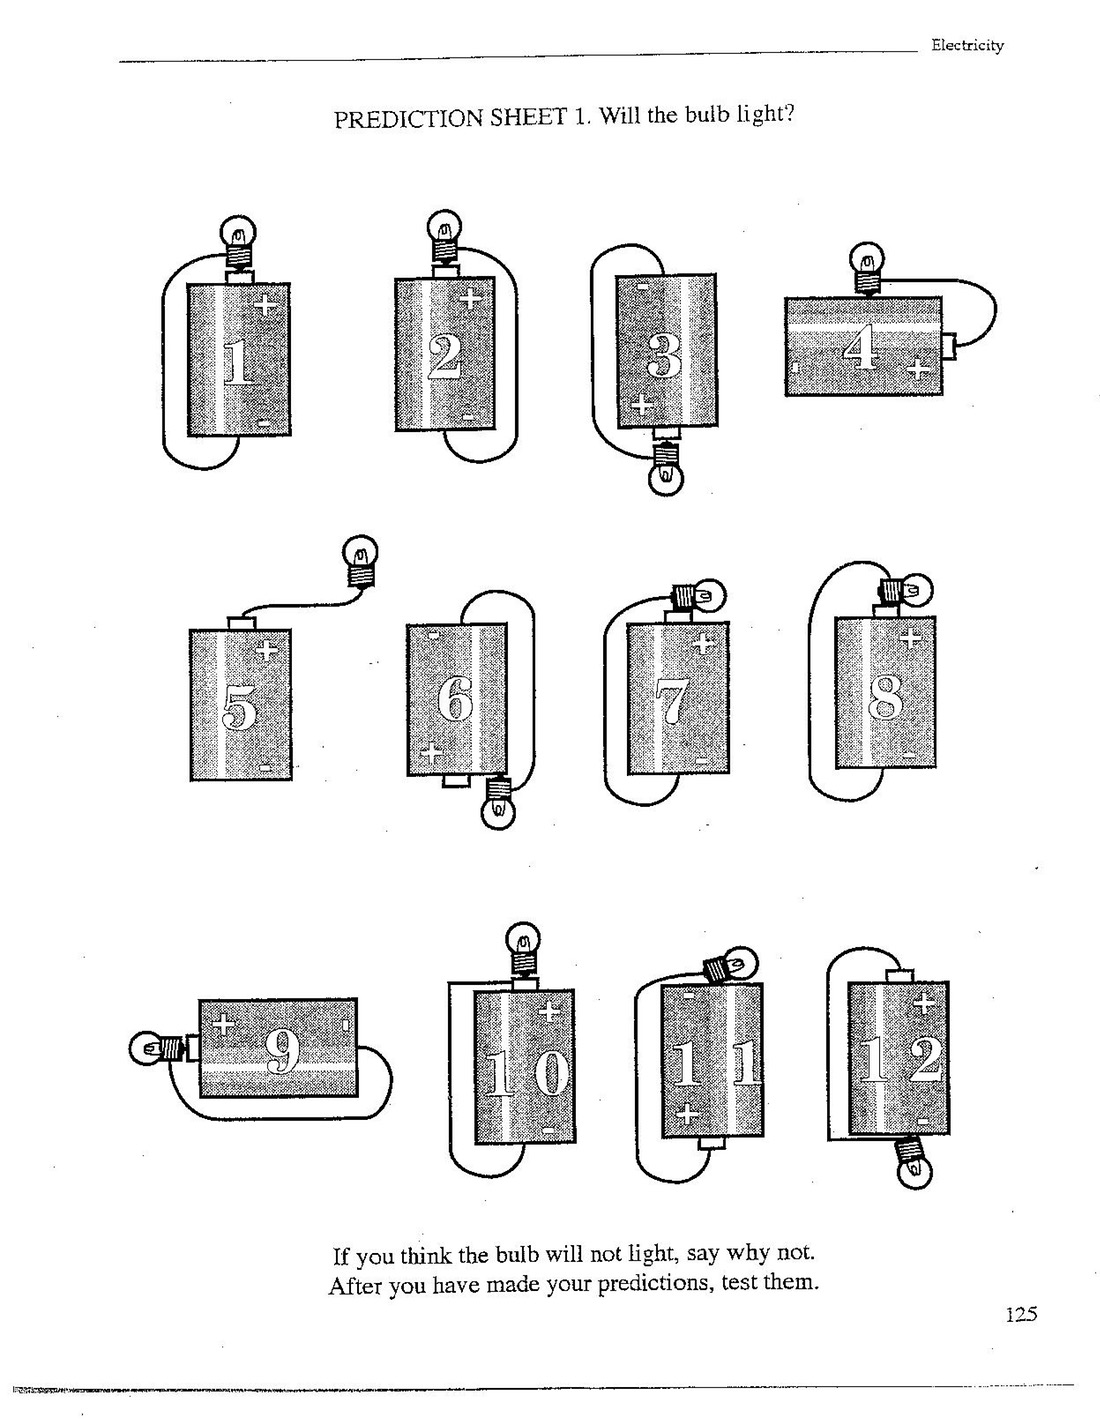 Component Electric Circuit Worksheet Electricity Unit Prezi For